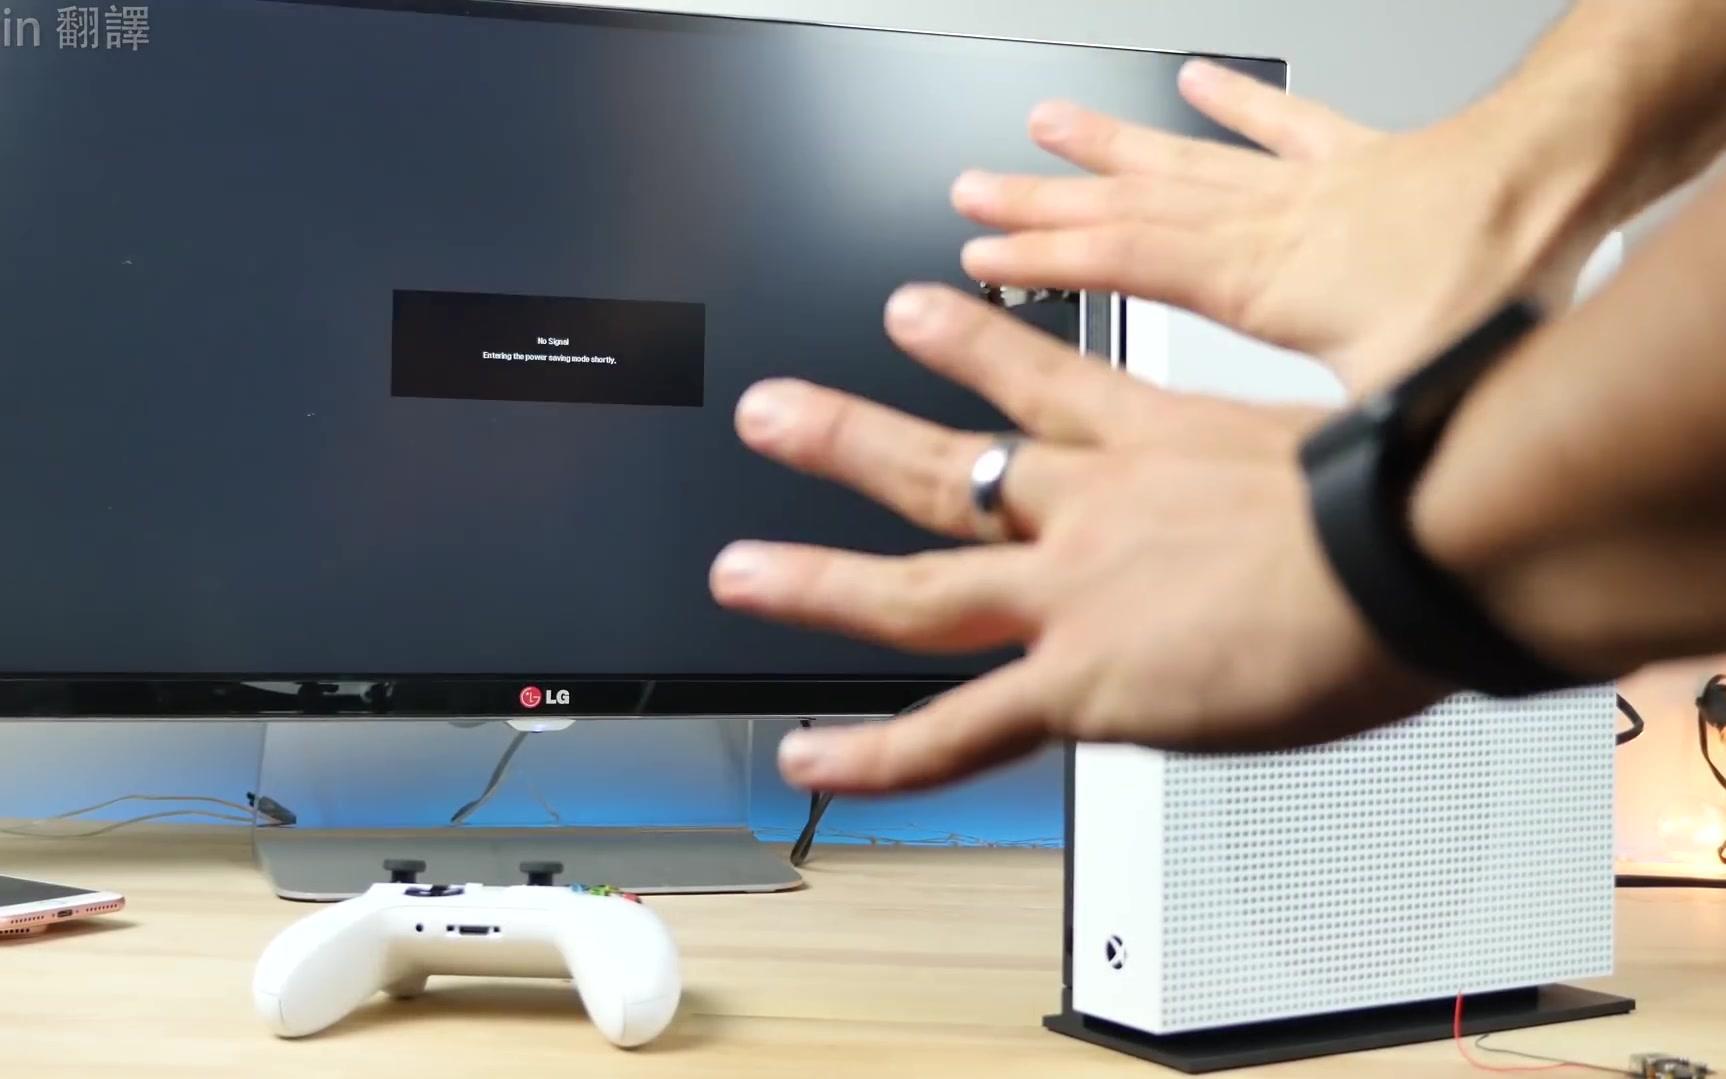 【家里有矿系列】当XBOX、PS4、Apple TV遇上USB电脑杀手 !P3(熟肉)_哔哩哔哩 (゜-゜)つロ 干杯~-bilibili